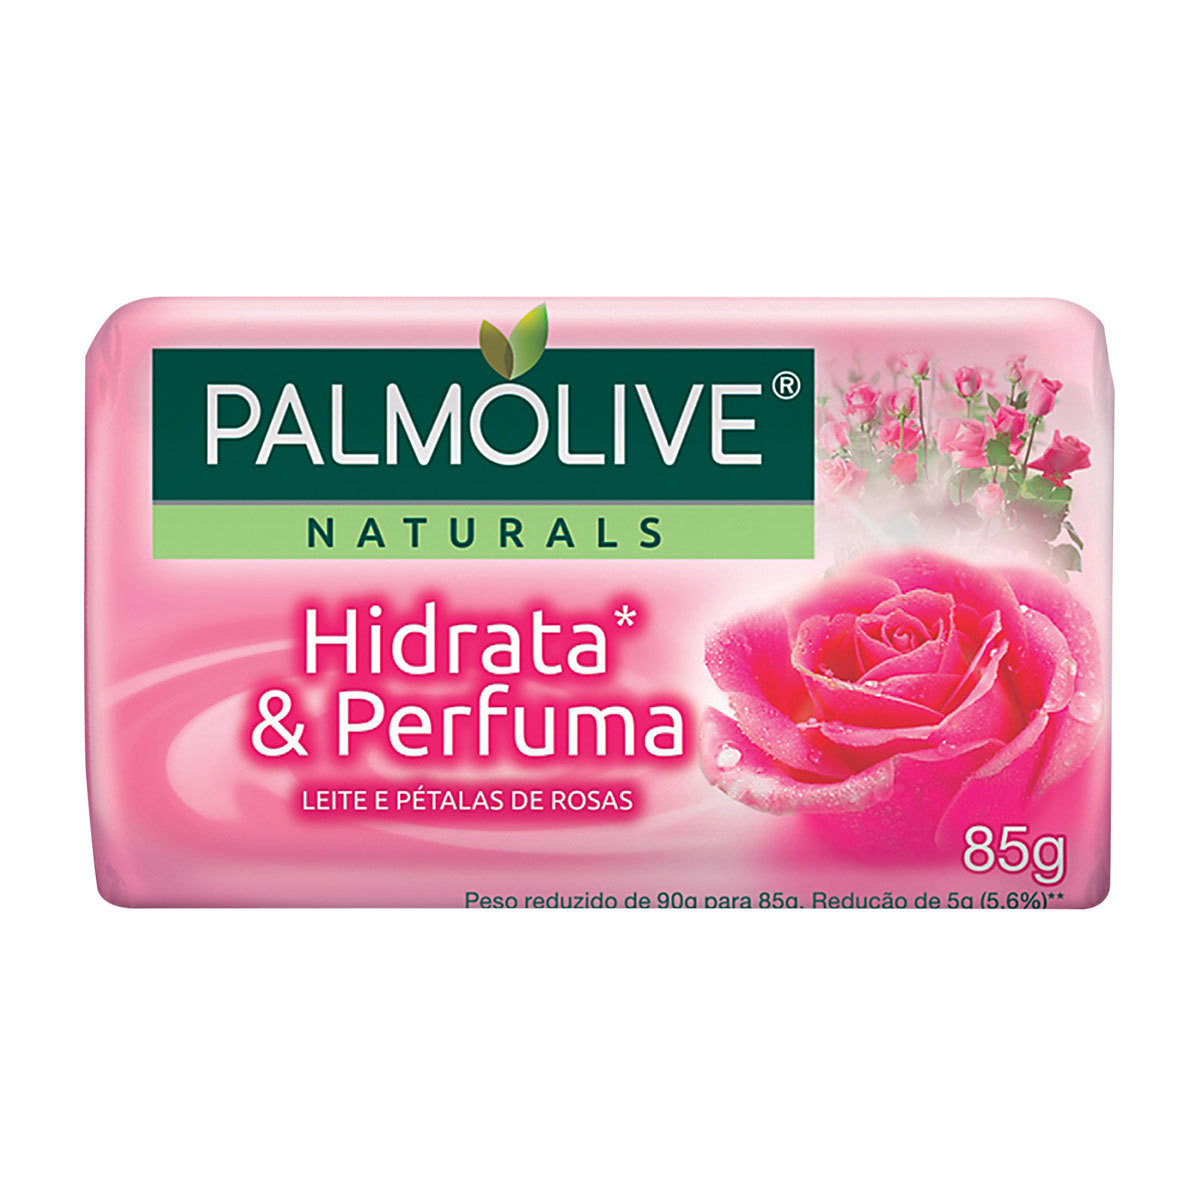 SABONETE PALMOLIVE PETALAS DE ROSA 85G